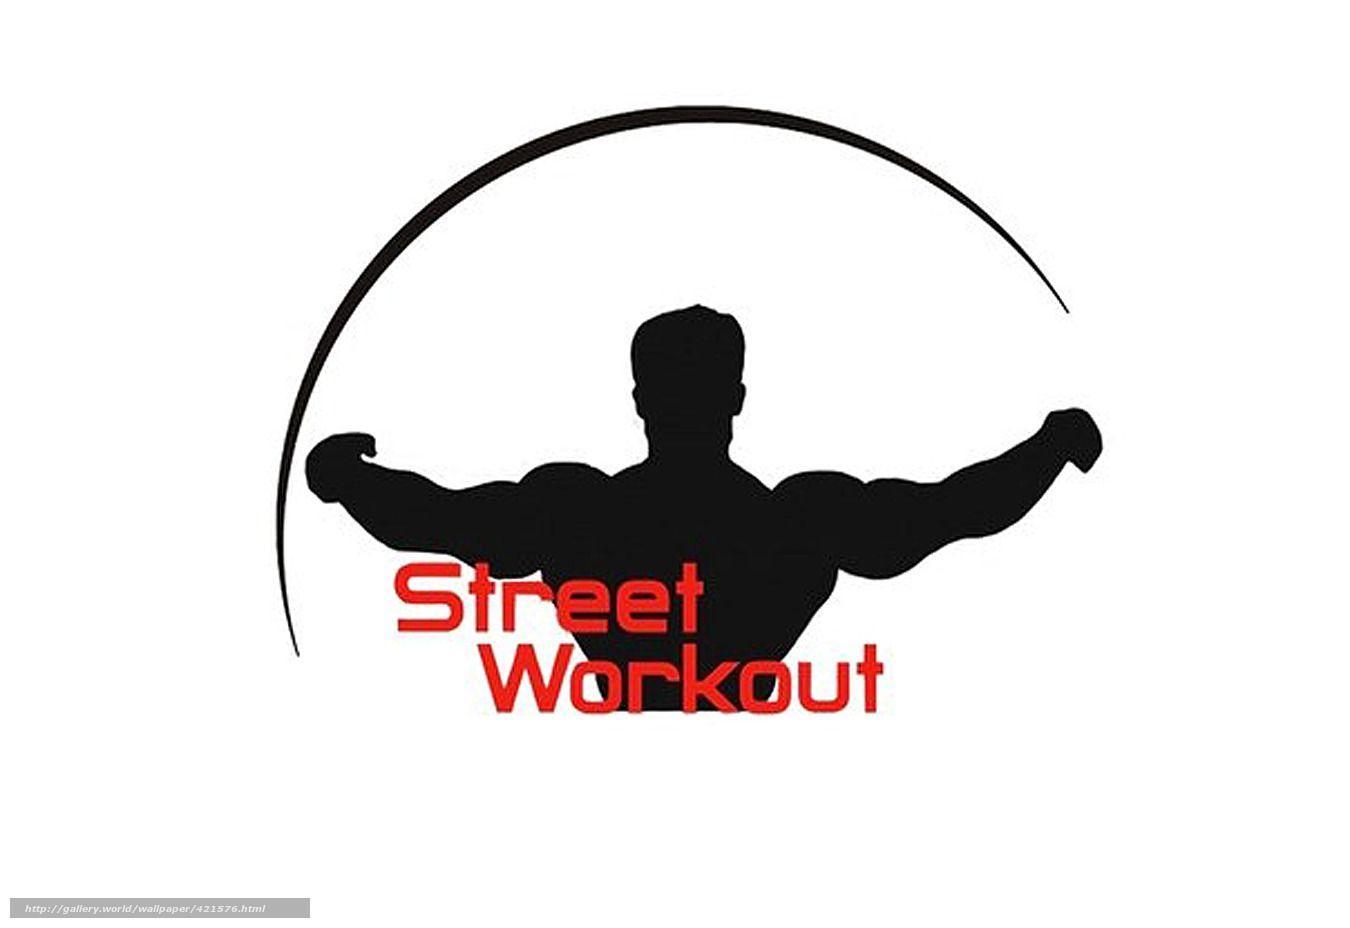 [47+] HD Workout Wallpaper on WallpaperSafari |Street Workout Wallpaper